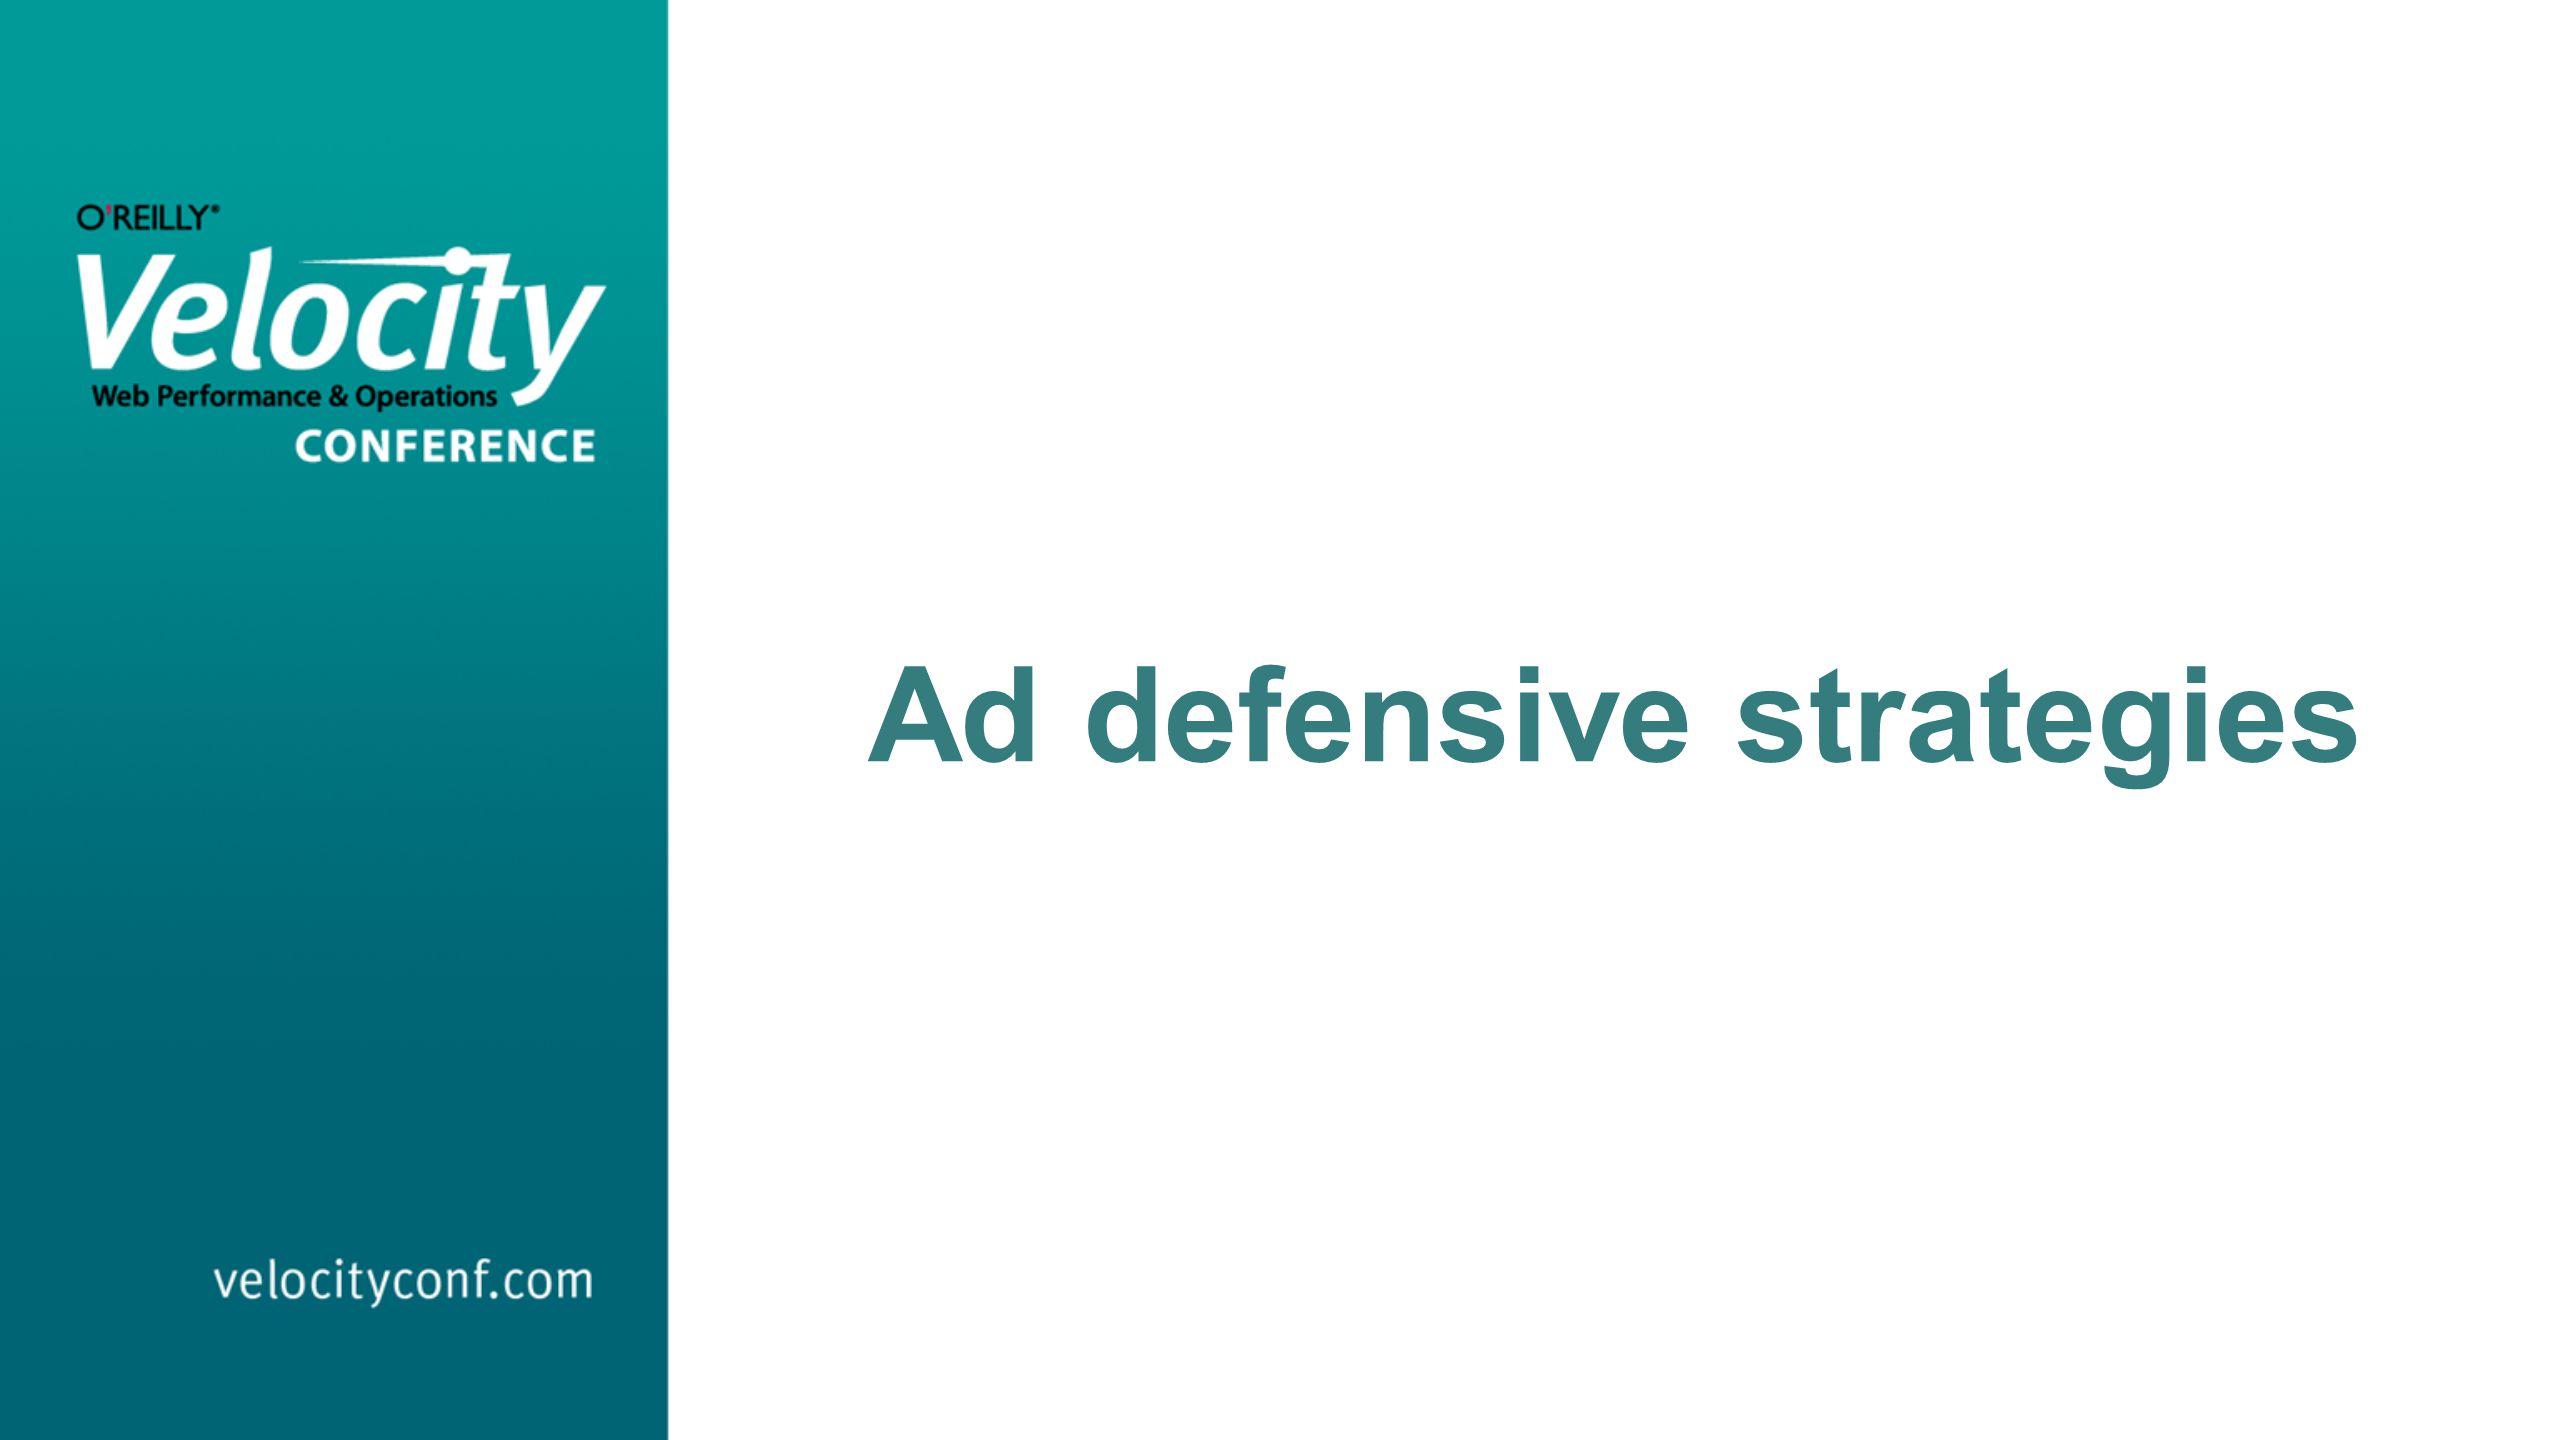 Ad defensive strategies